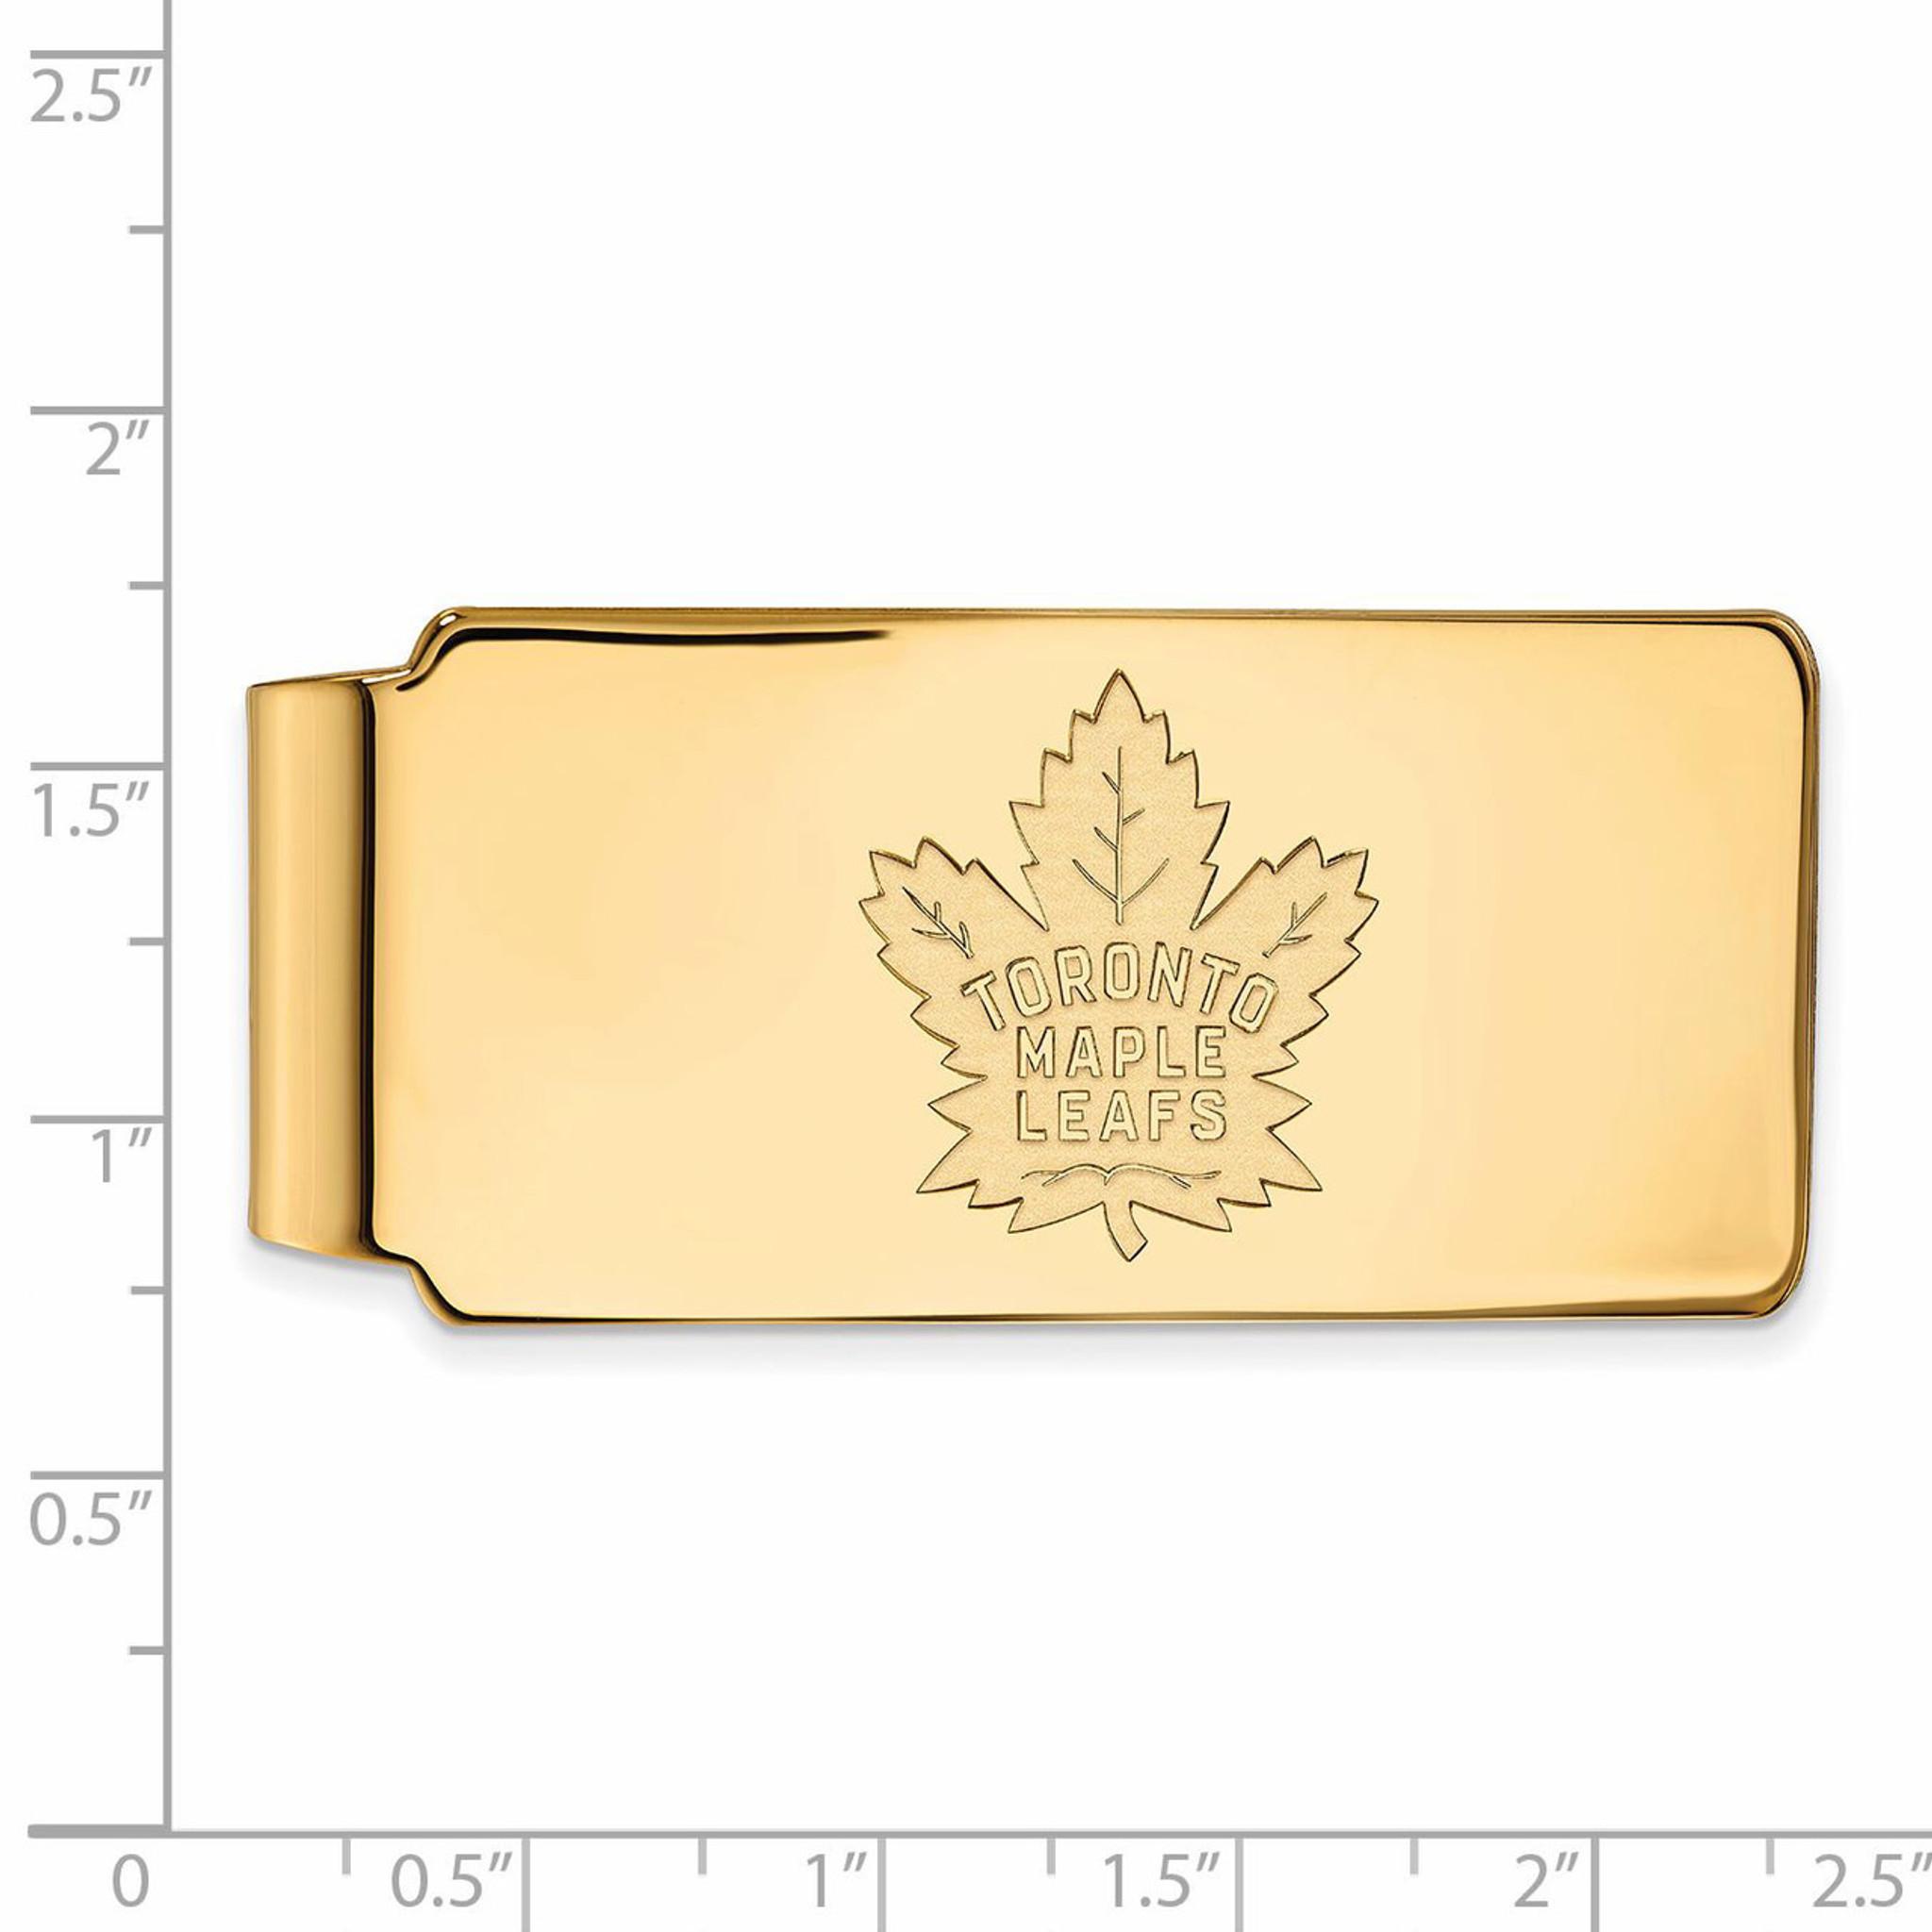 Toronto Maple Leafs Money Clip 14k Yellow Gold 4y015mle Nhl Homebello